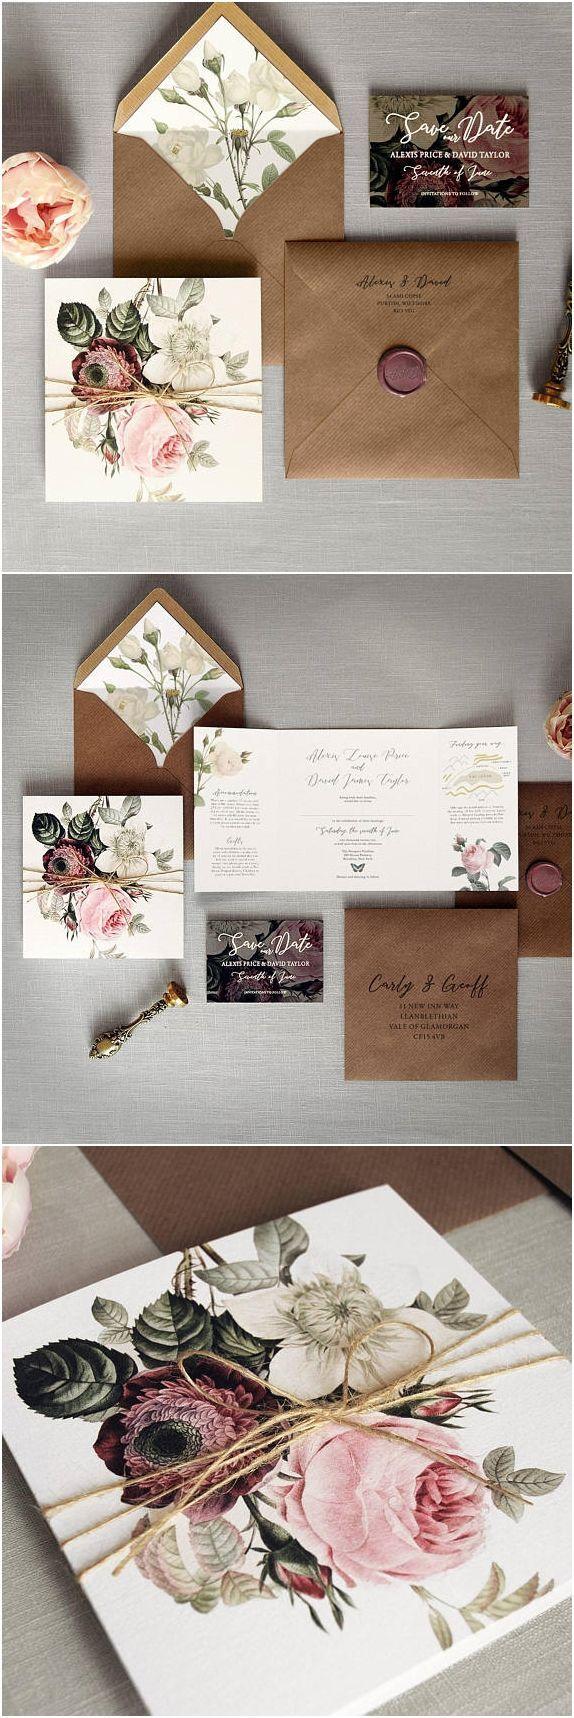 English Garden - Luxury Folding Wedding Invitations & Save the ...